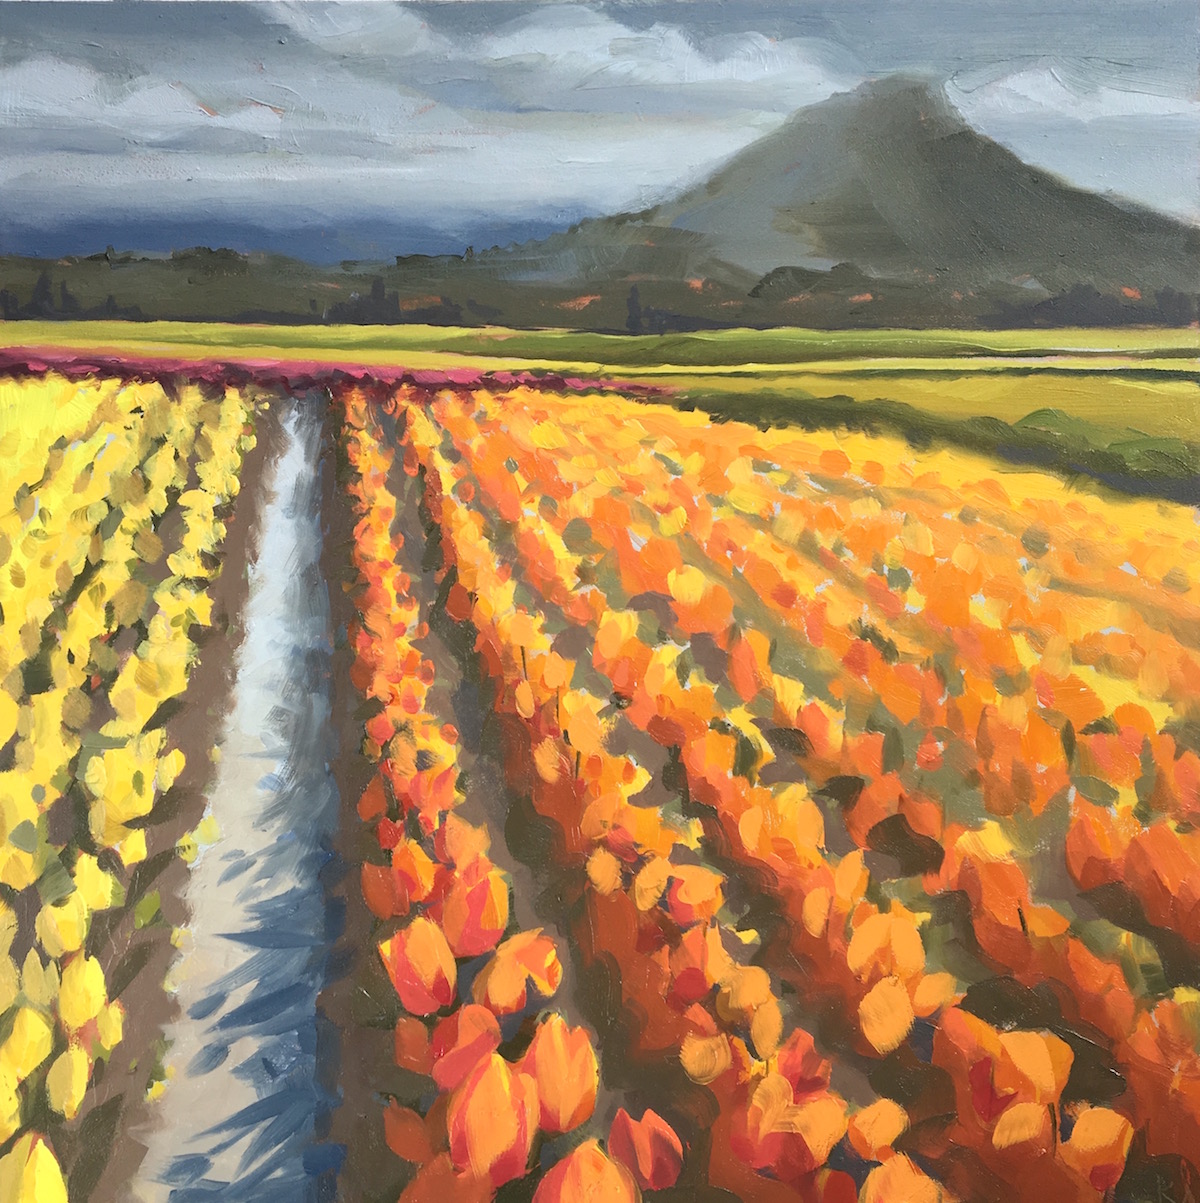 Skagit Valley Tulips Oil Painting